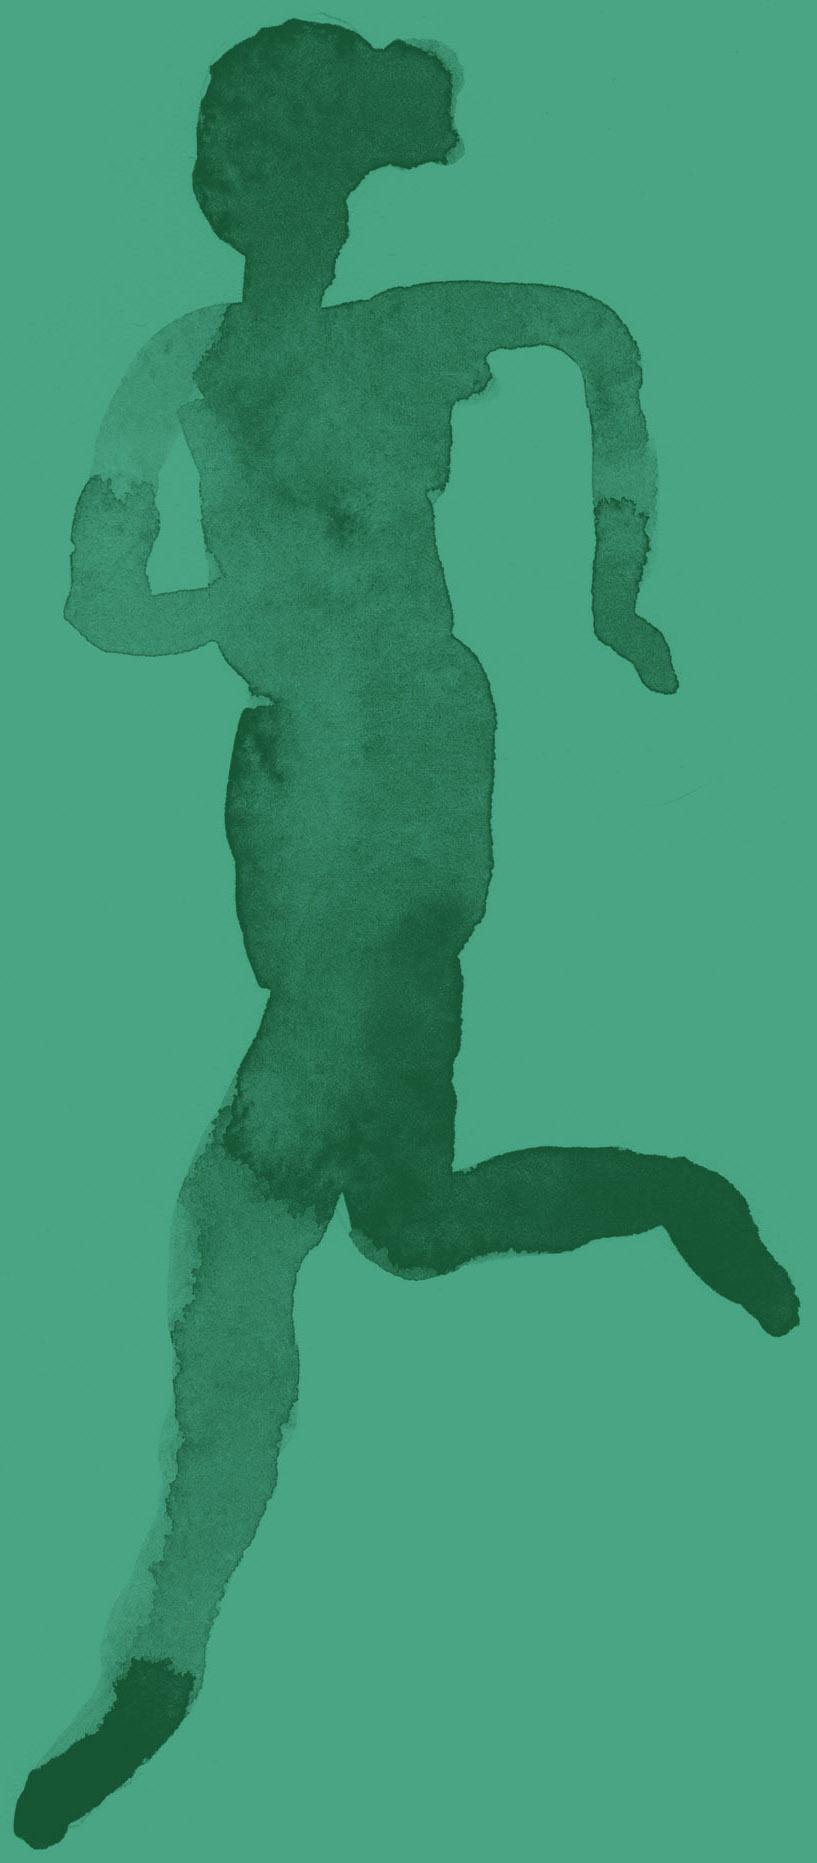 LeHuppé_ROGÉ_ILLUSTRATION_jogging-01